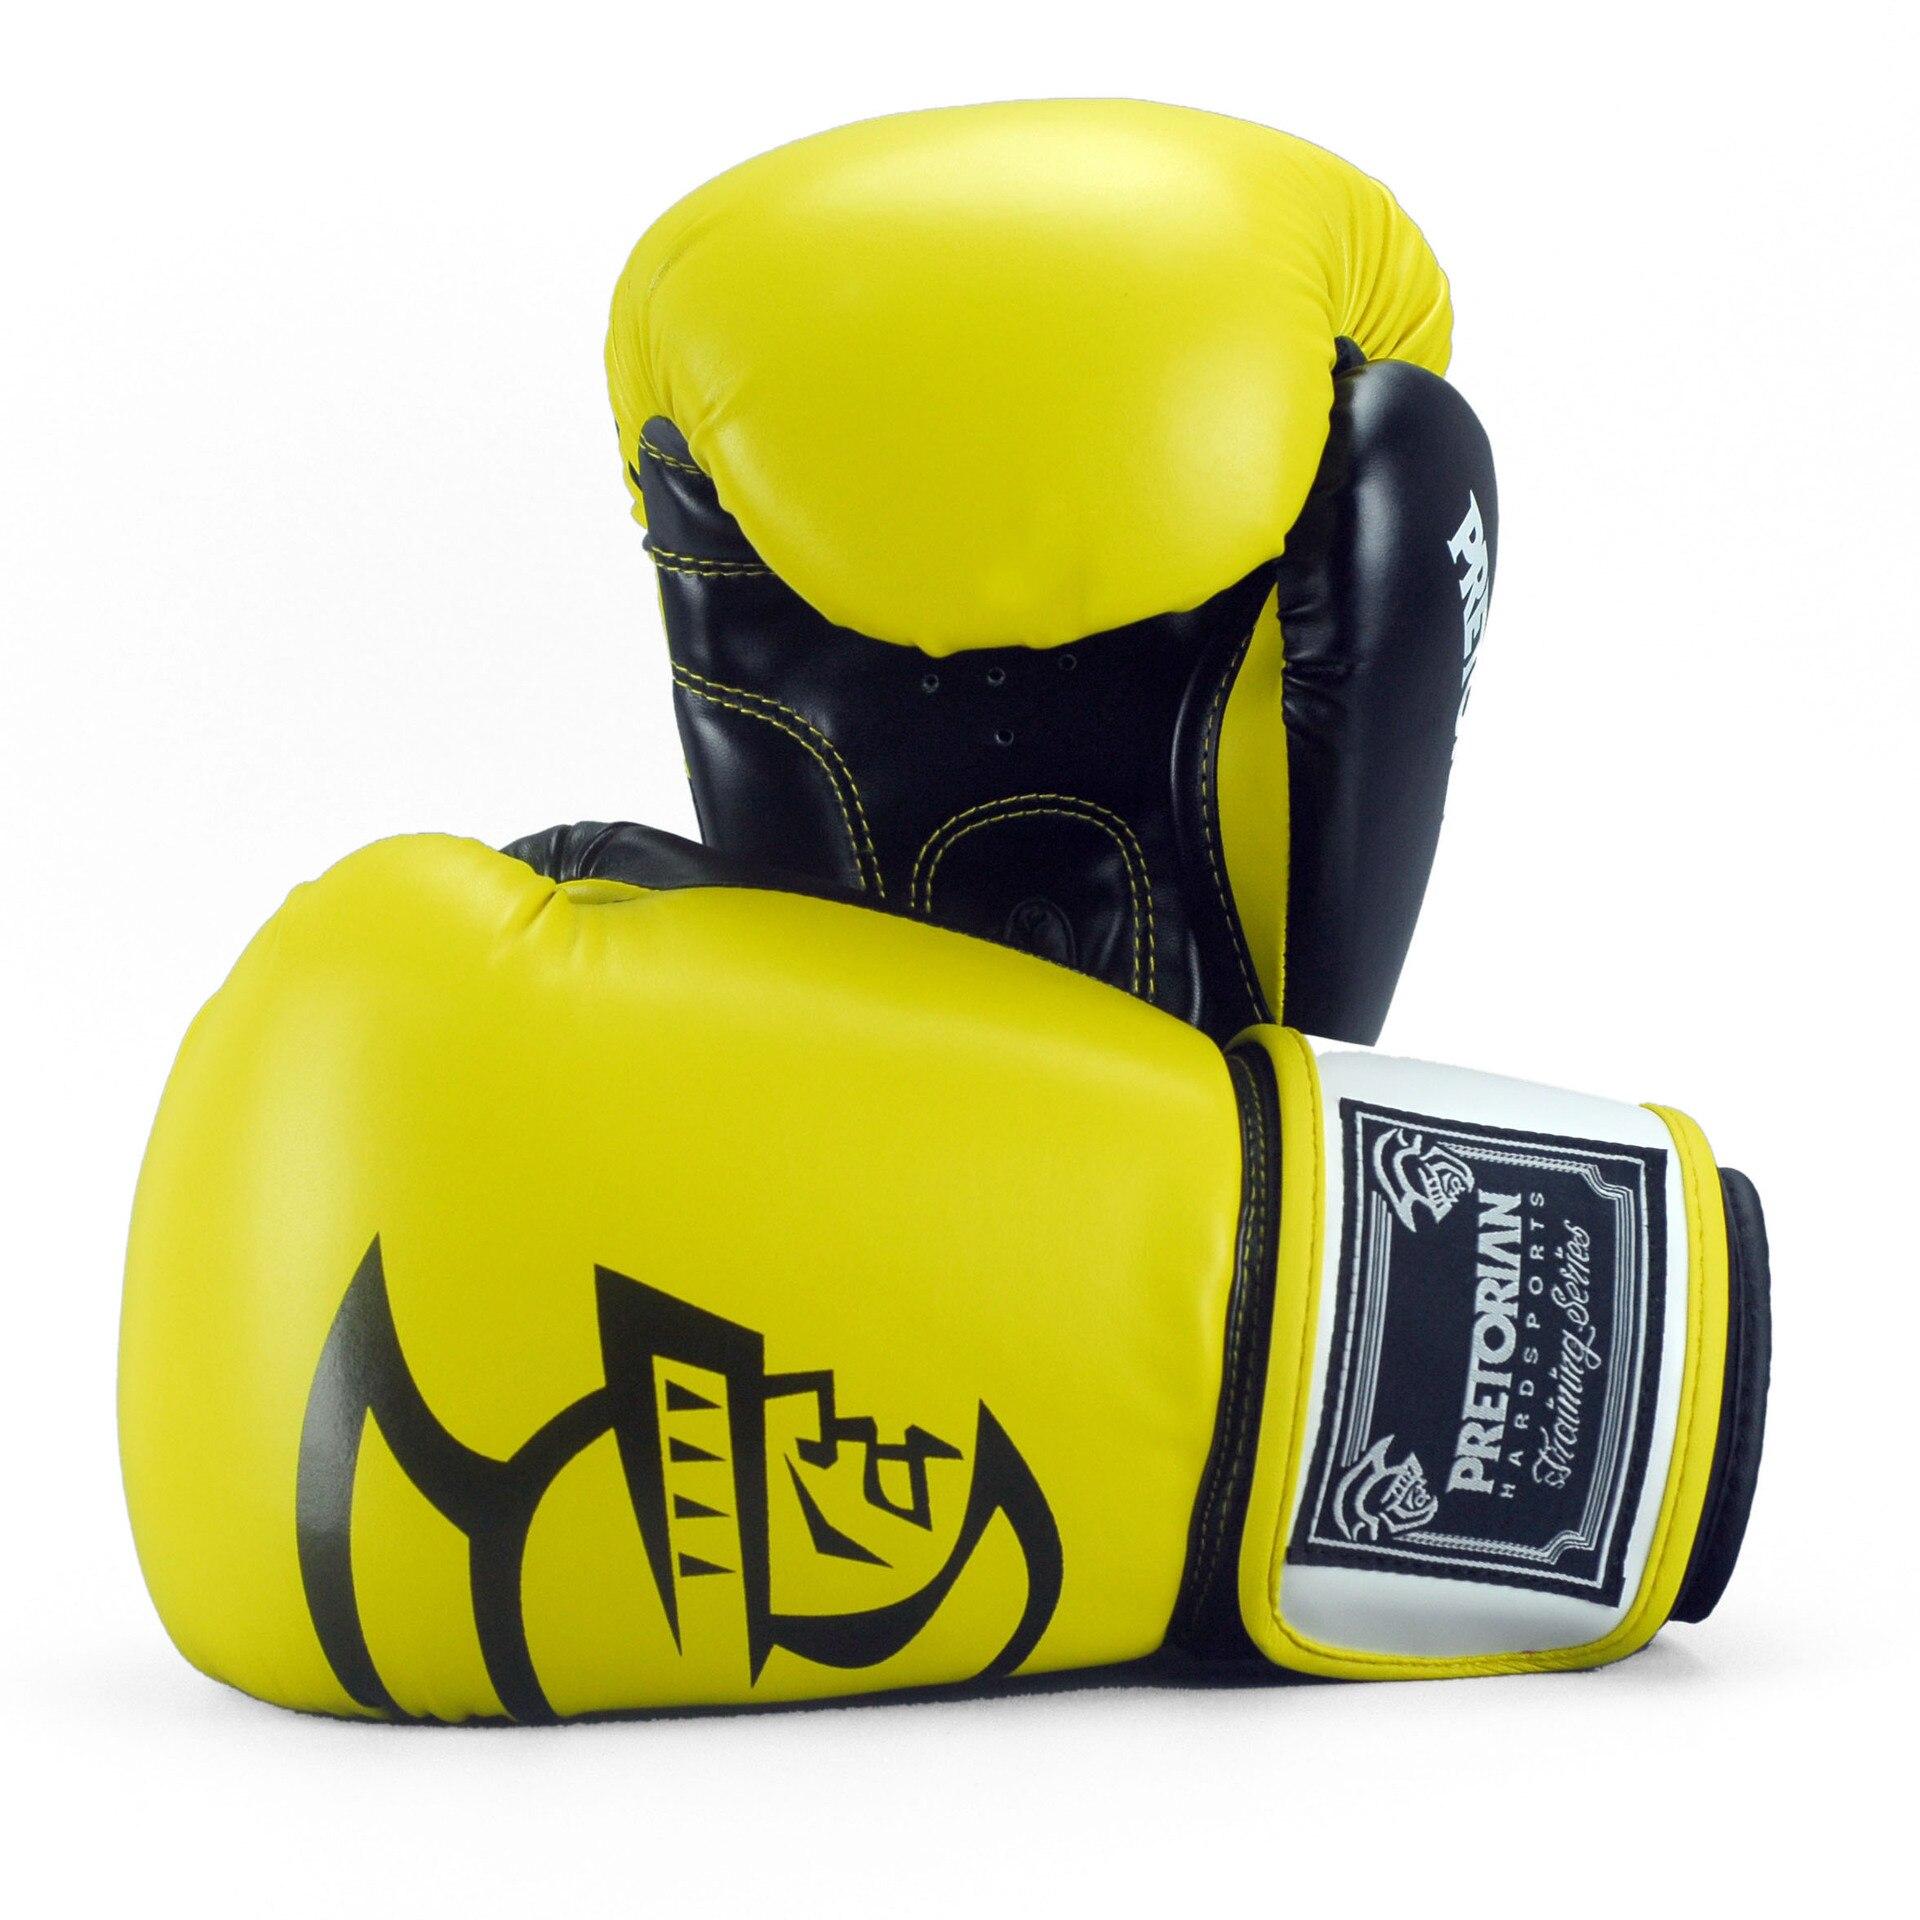 10/12/14/16OZ Kids Adults Women Men Boxing Gloves MMA Sanda Muay Thai Boxe Mitts Pro Punch Training Equipment 2017DBO